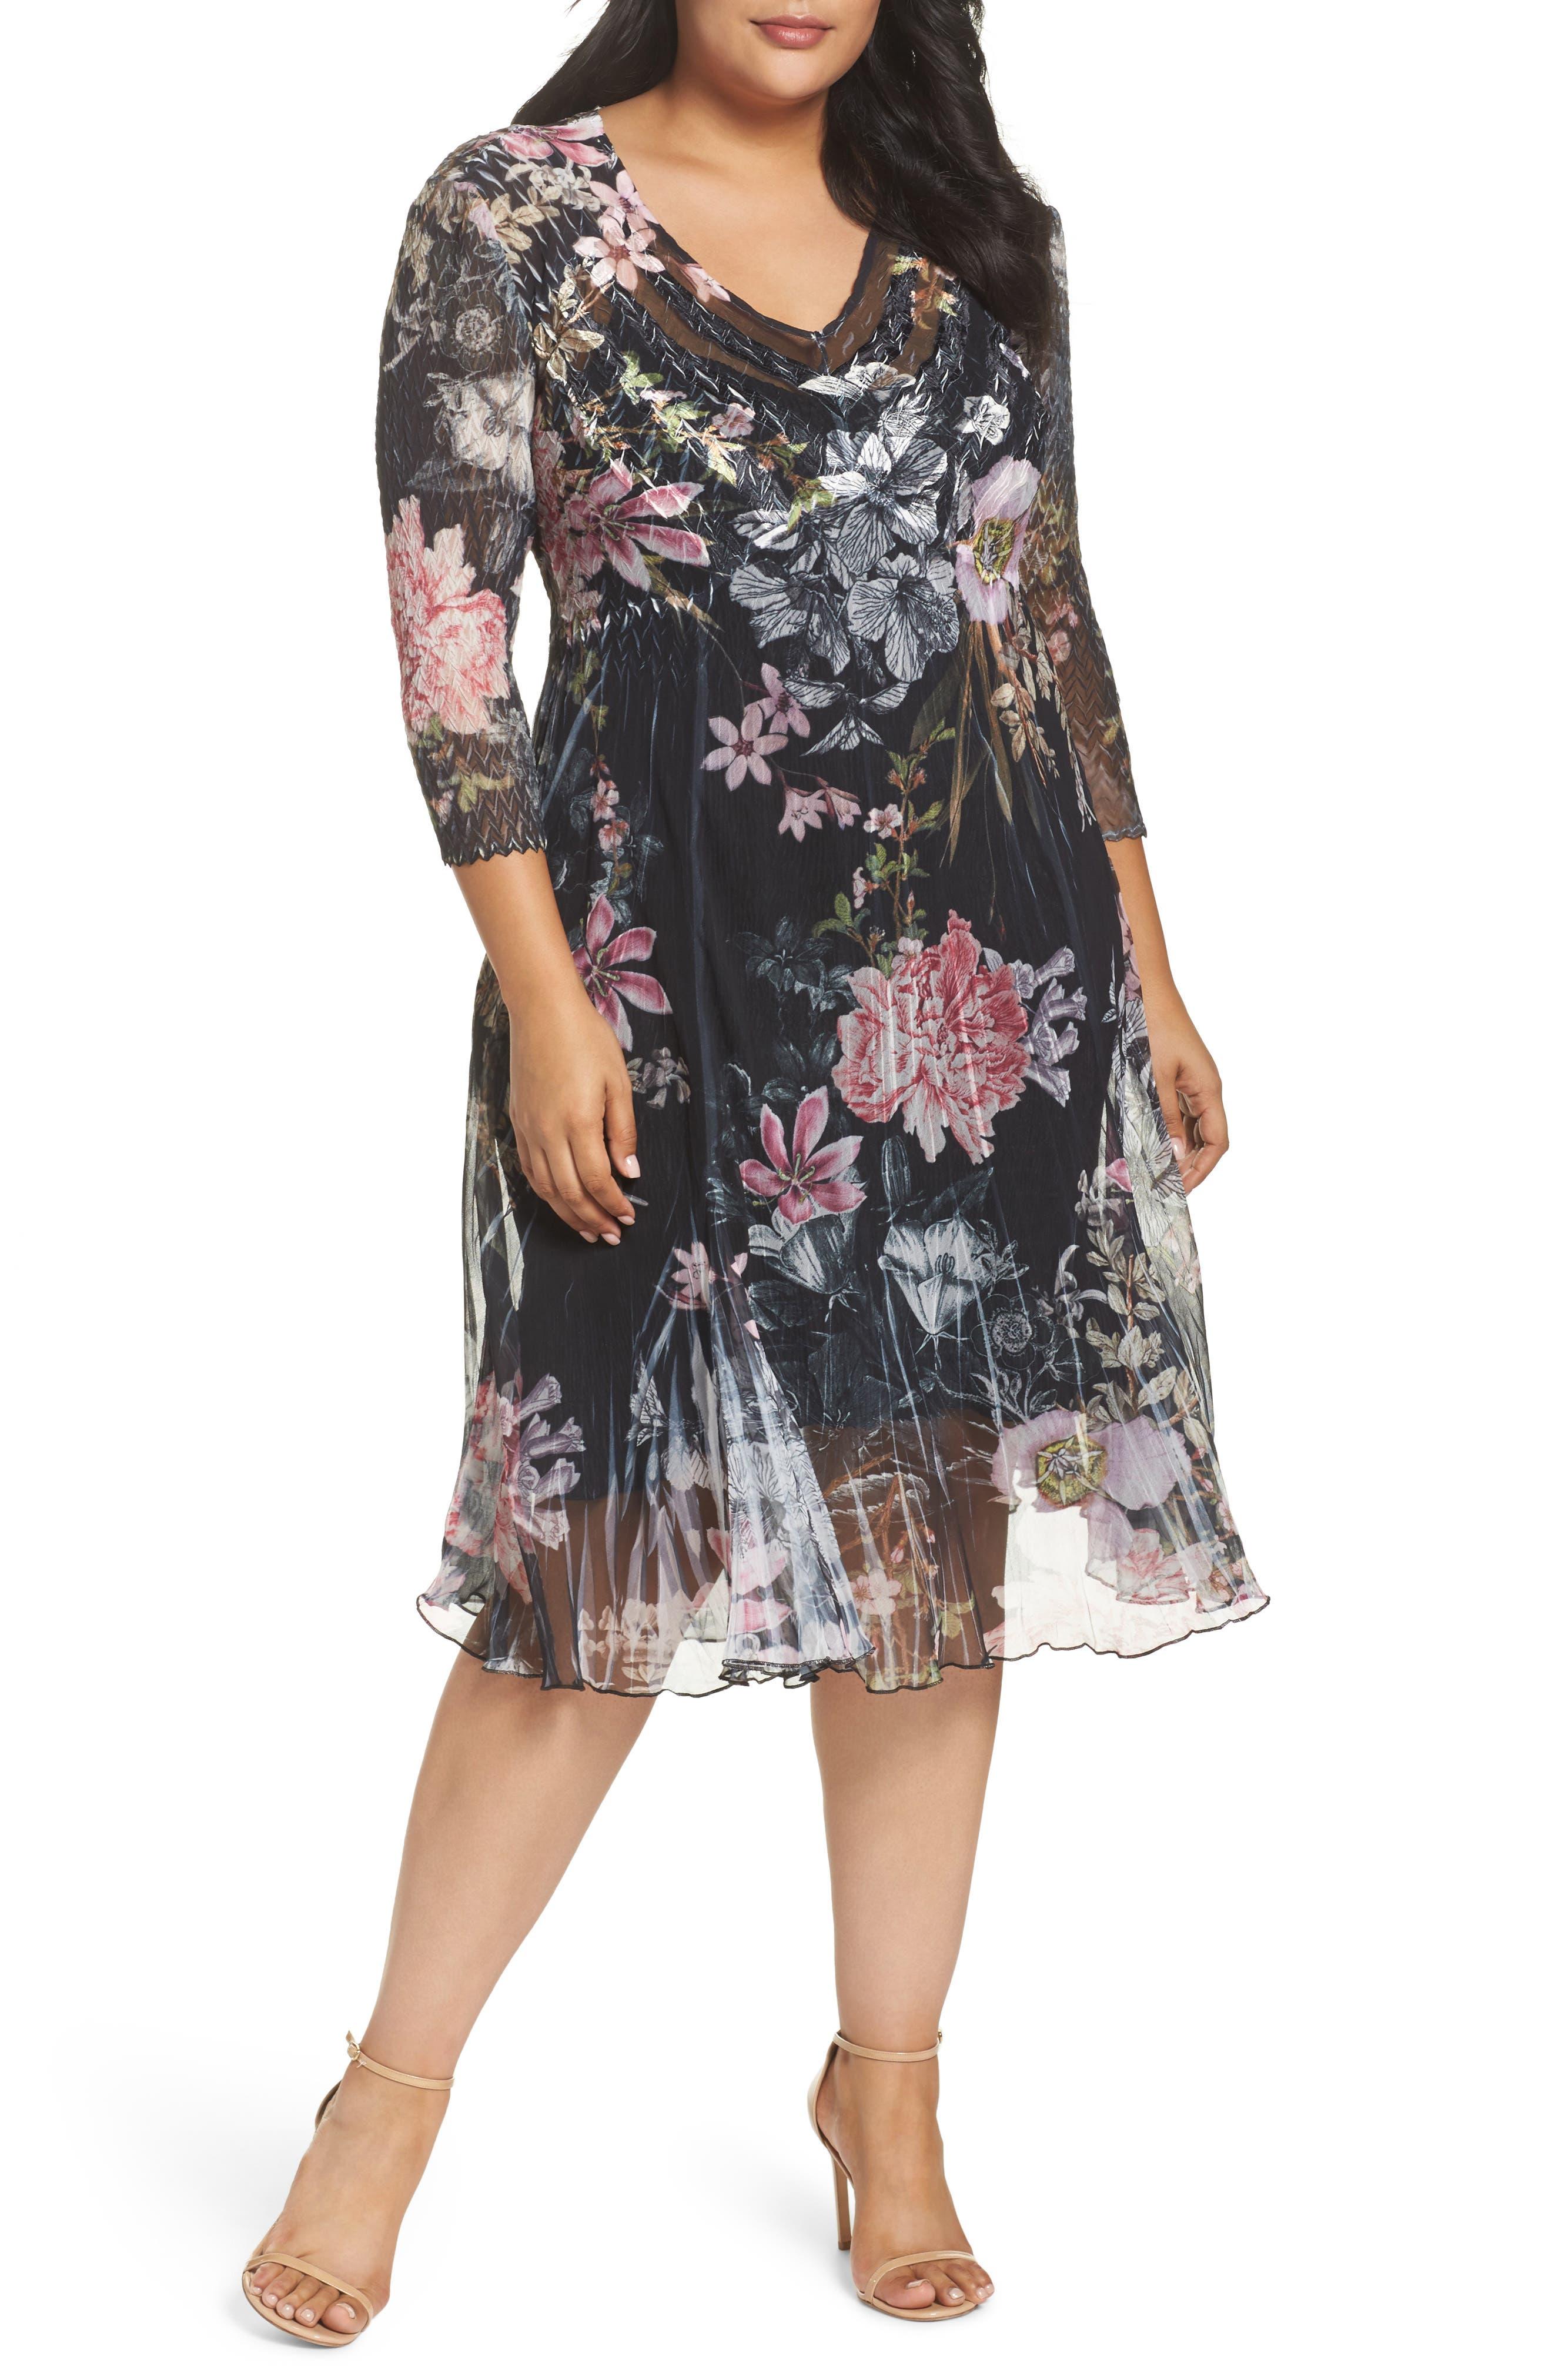 Main Image - Kamarov Floral Charmeuse & Chiffon Floral A-Line Dress (Plus Size)